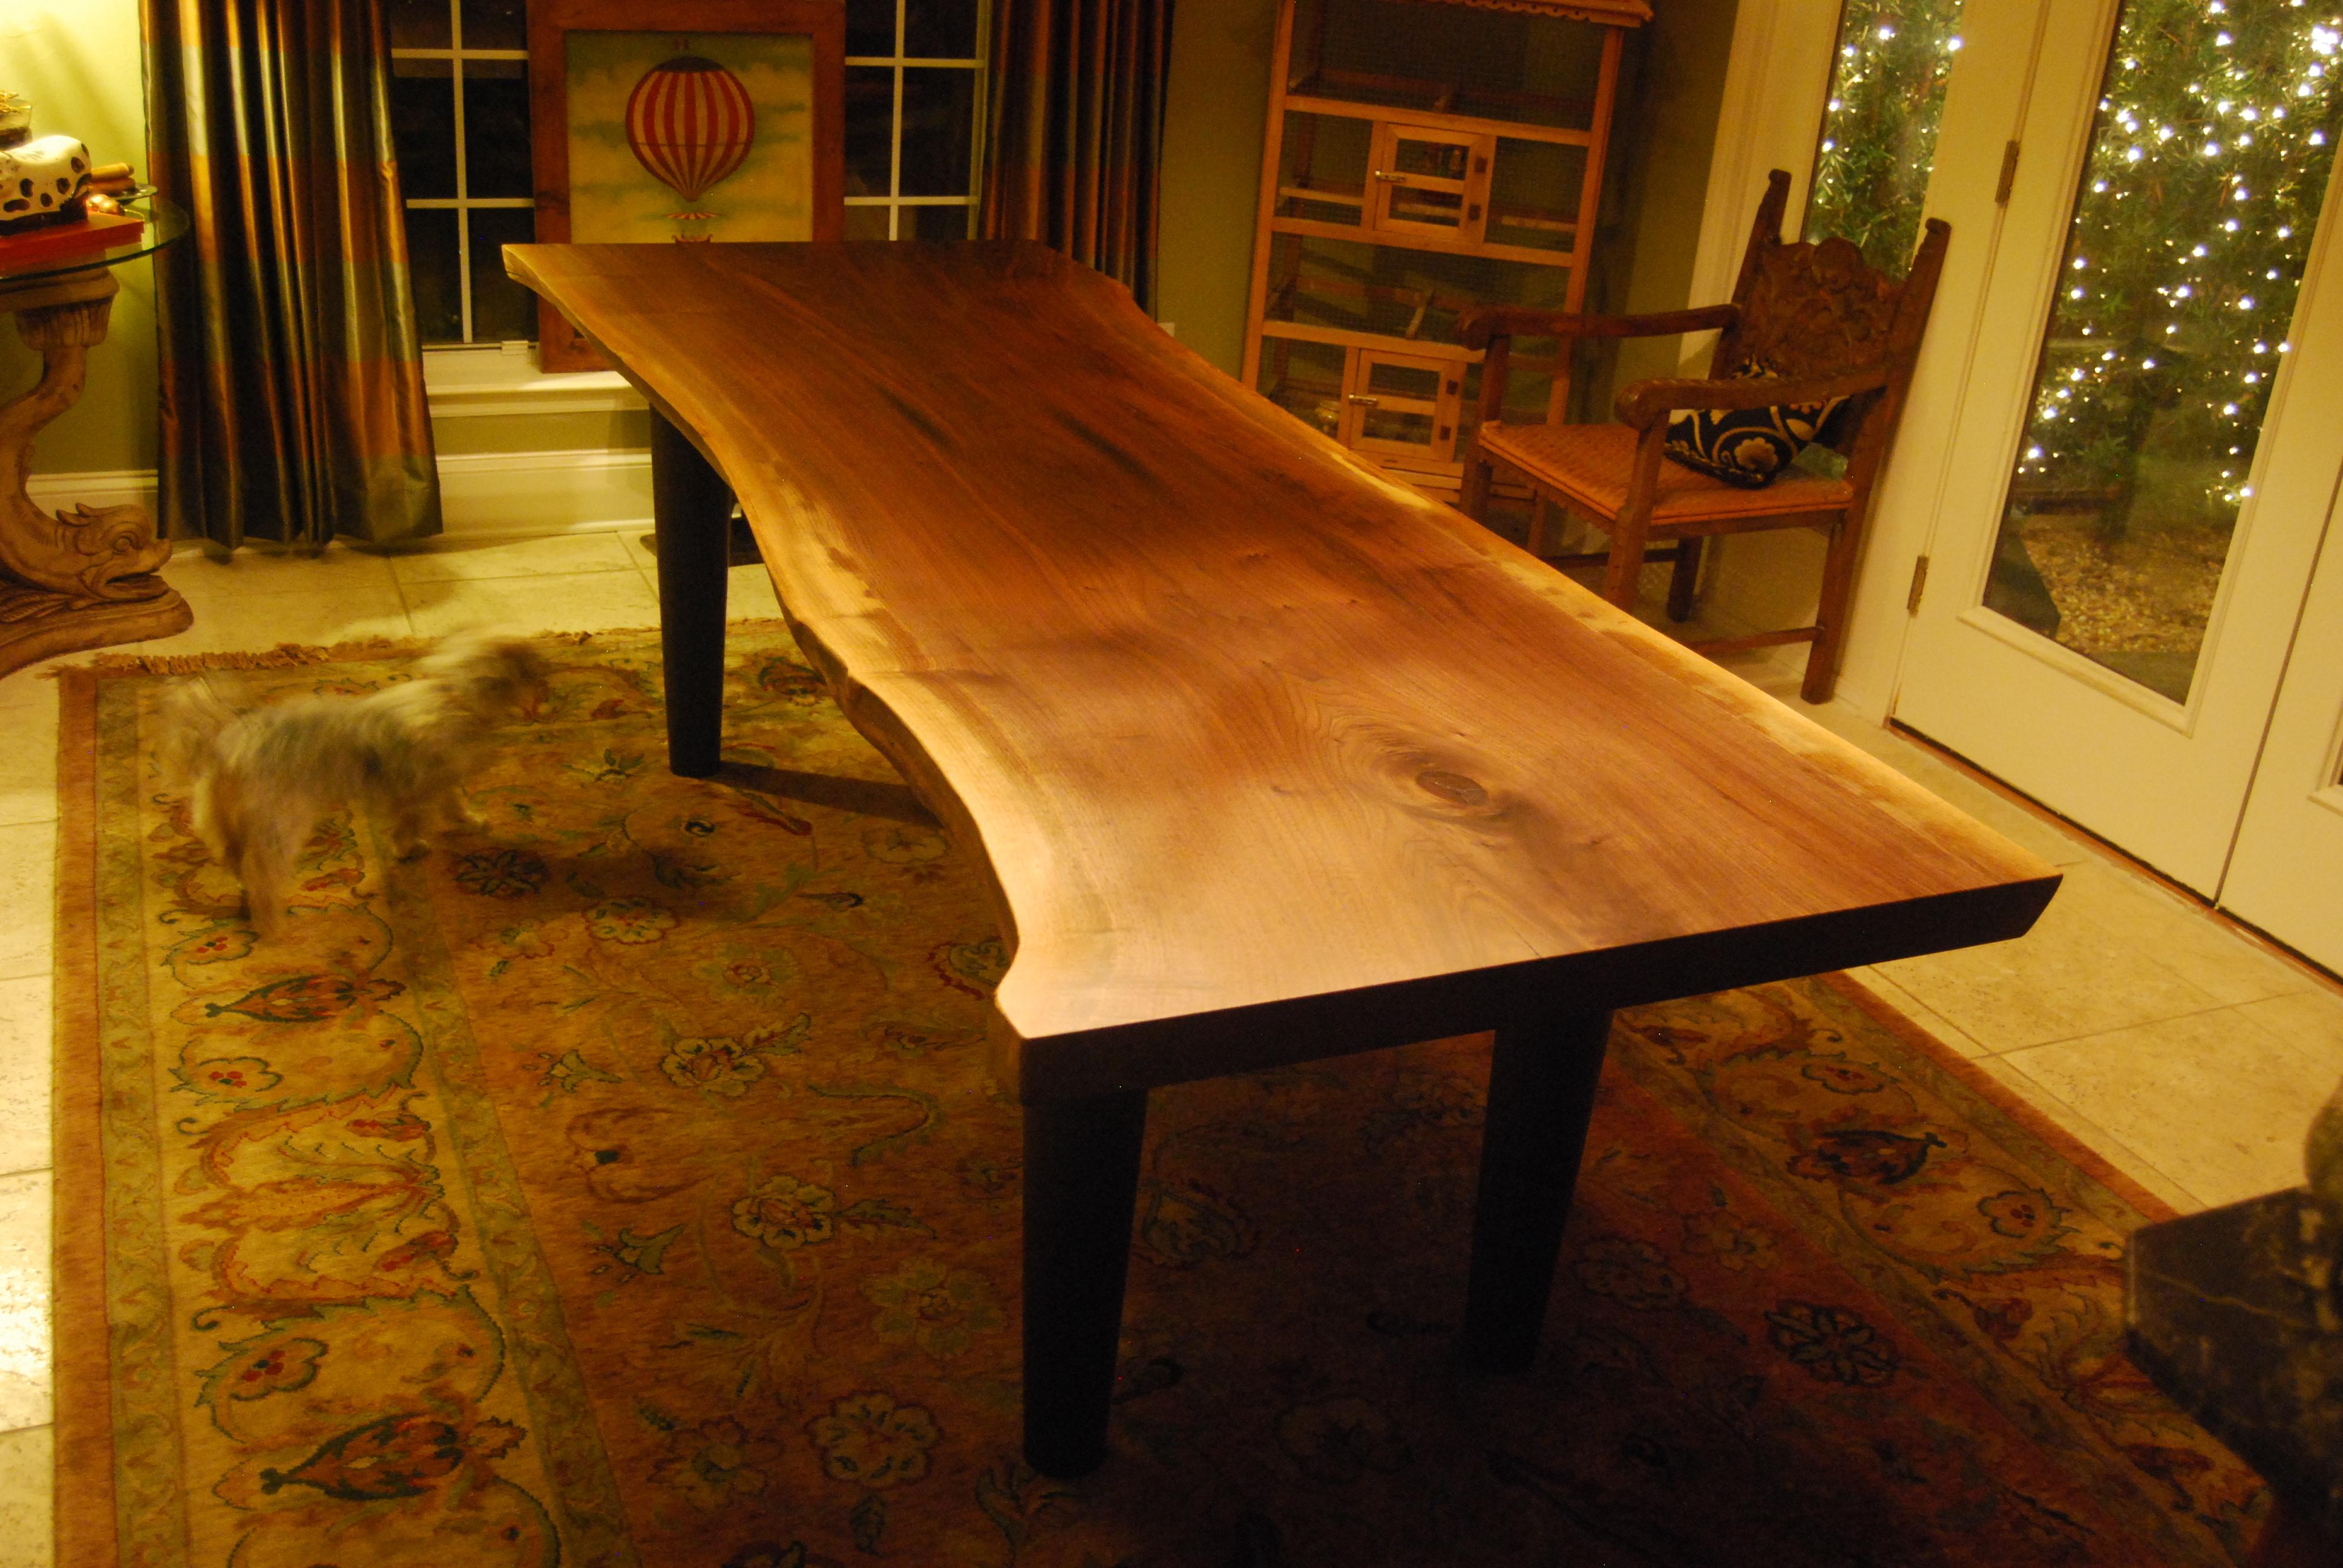 Odiesoil+walnut+wenge+table+perfect+wood+finish.jpg